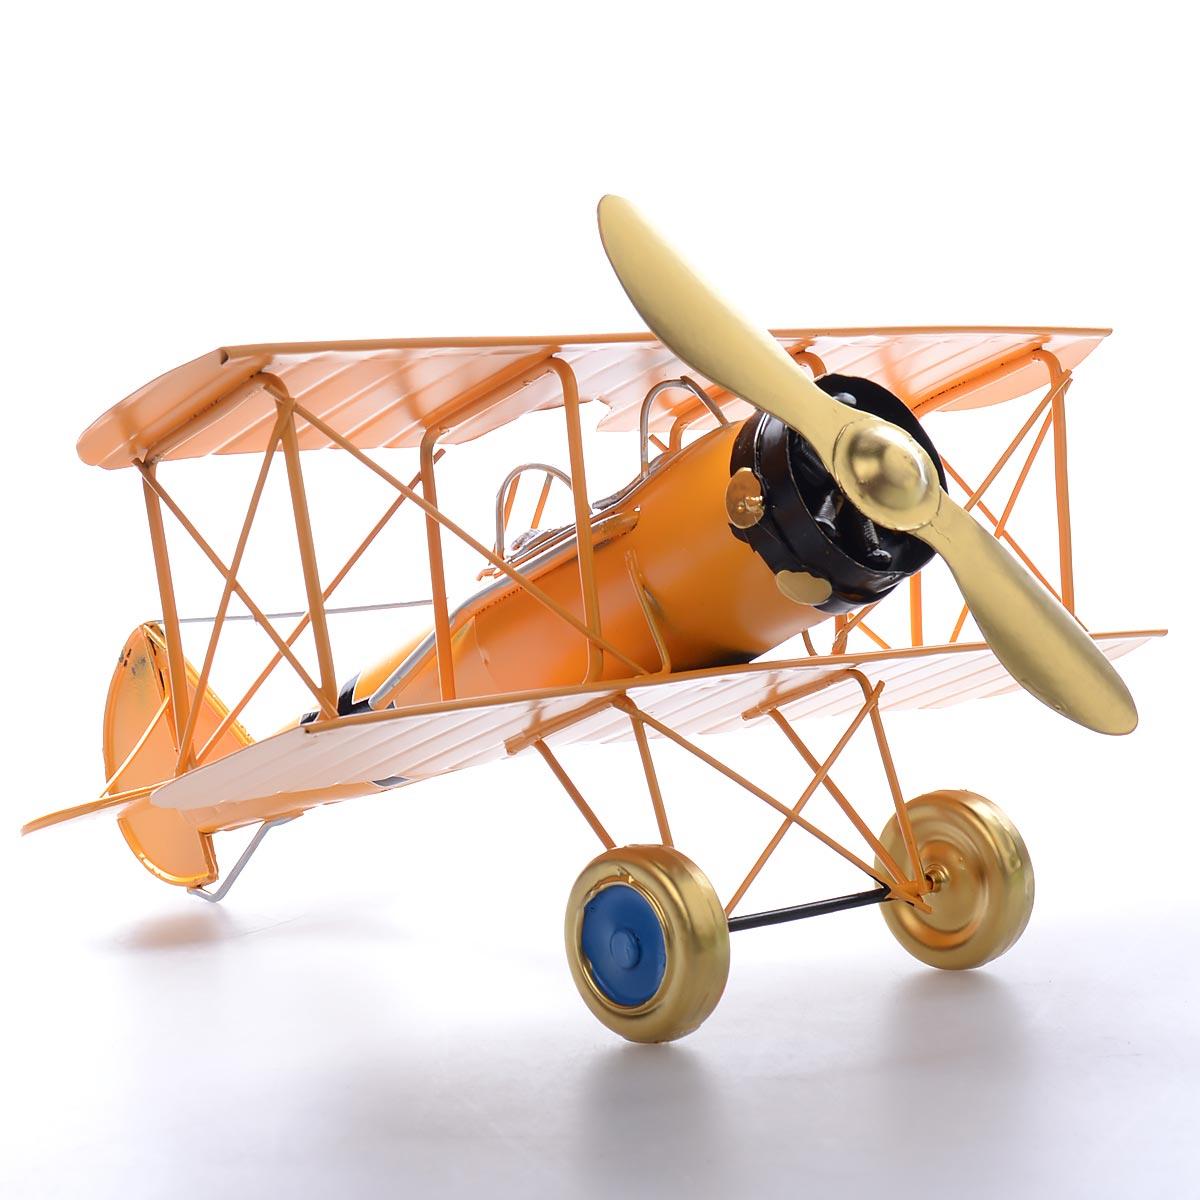 Vintage χειροποίητο διακοσμητικό αεροπλάνο μεταλλικό  - OEM 51635